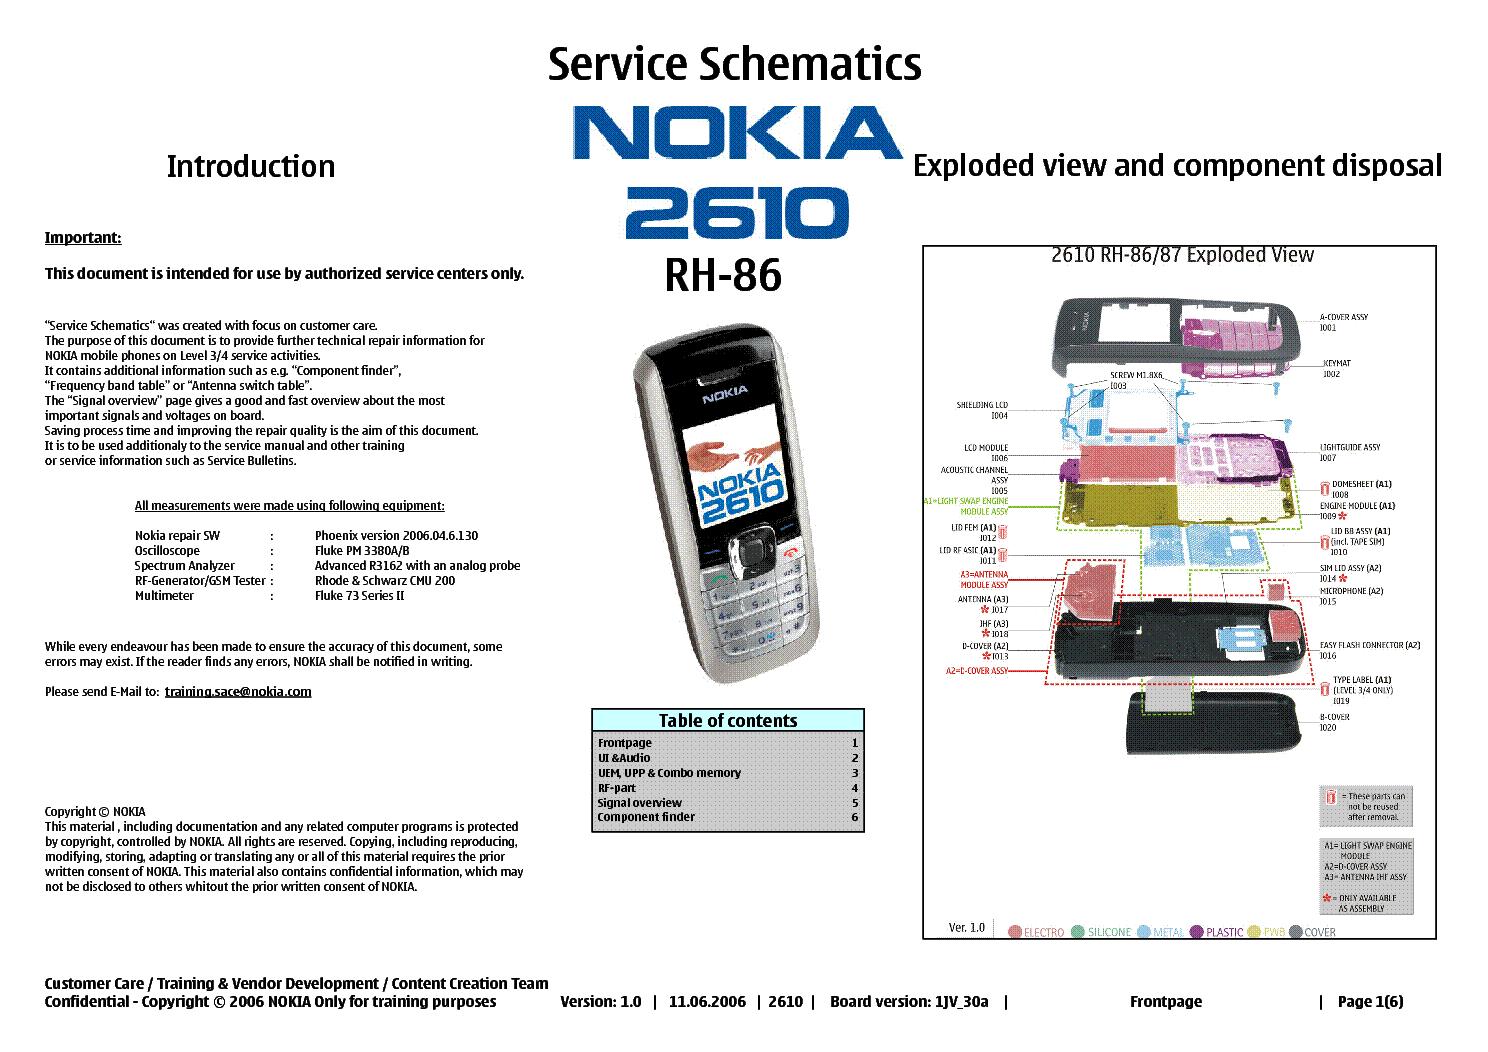 nokia 2610 rh86 service schematics service manual download rh elektrotanya com  nokia 2610 repair manual